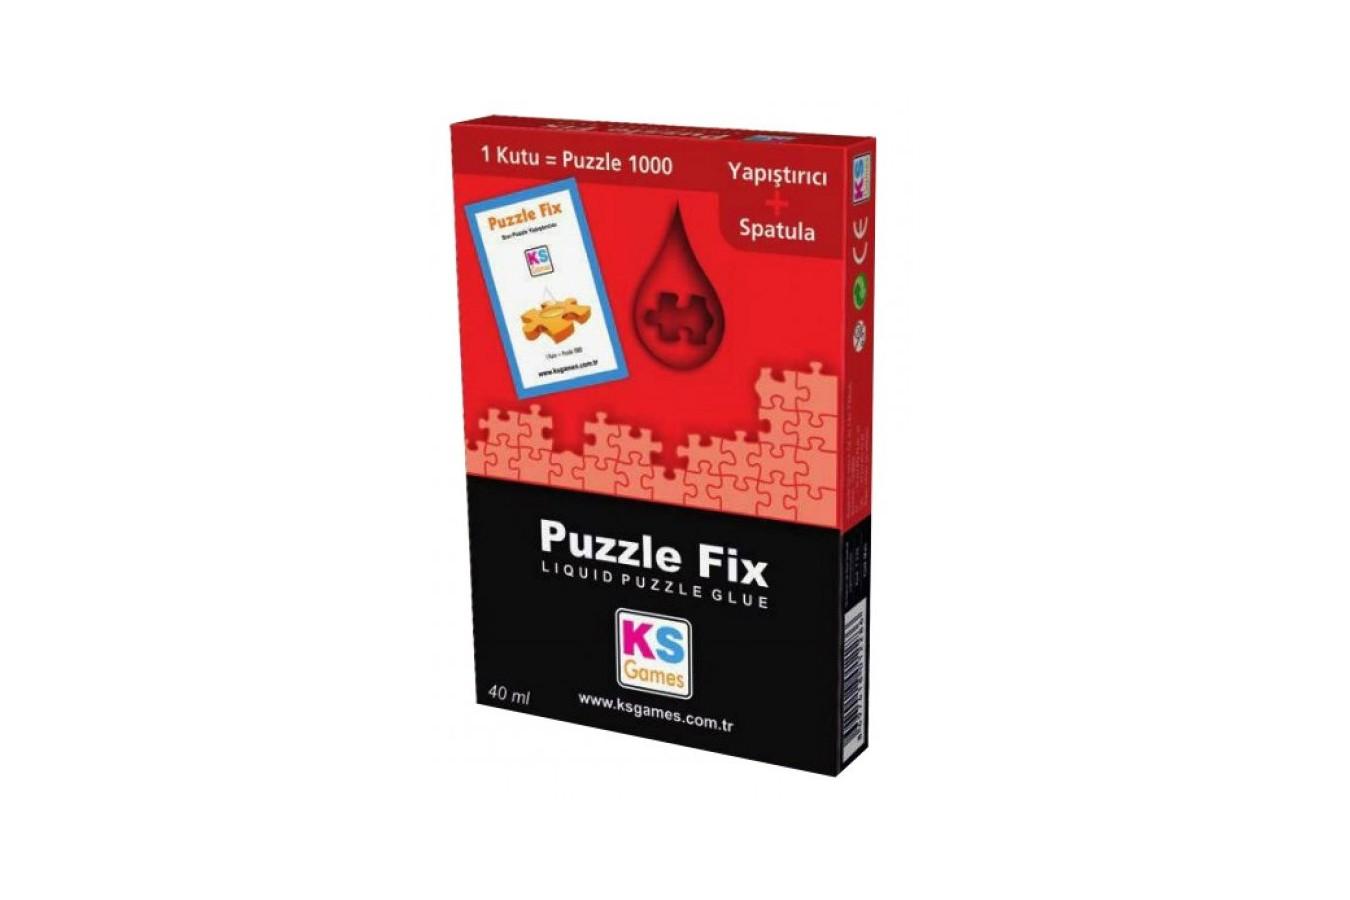 Lipici pentru puzzle KS Games, 1000 Pieces, 40 ml (KS-Games-T228) imagine